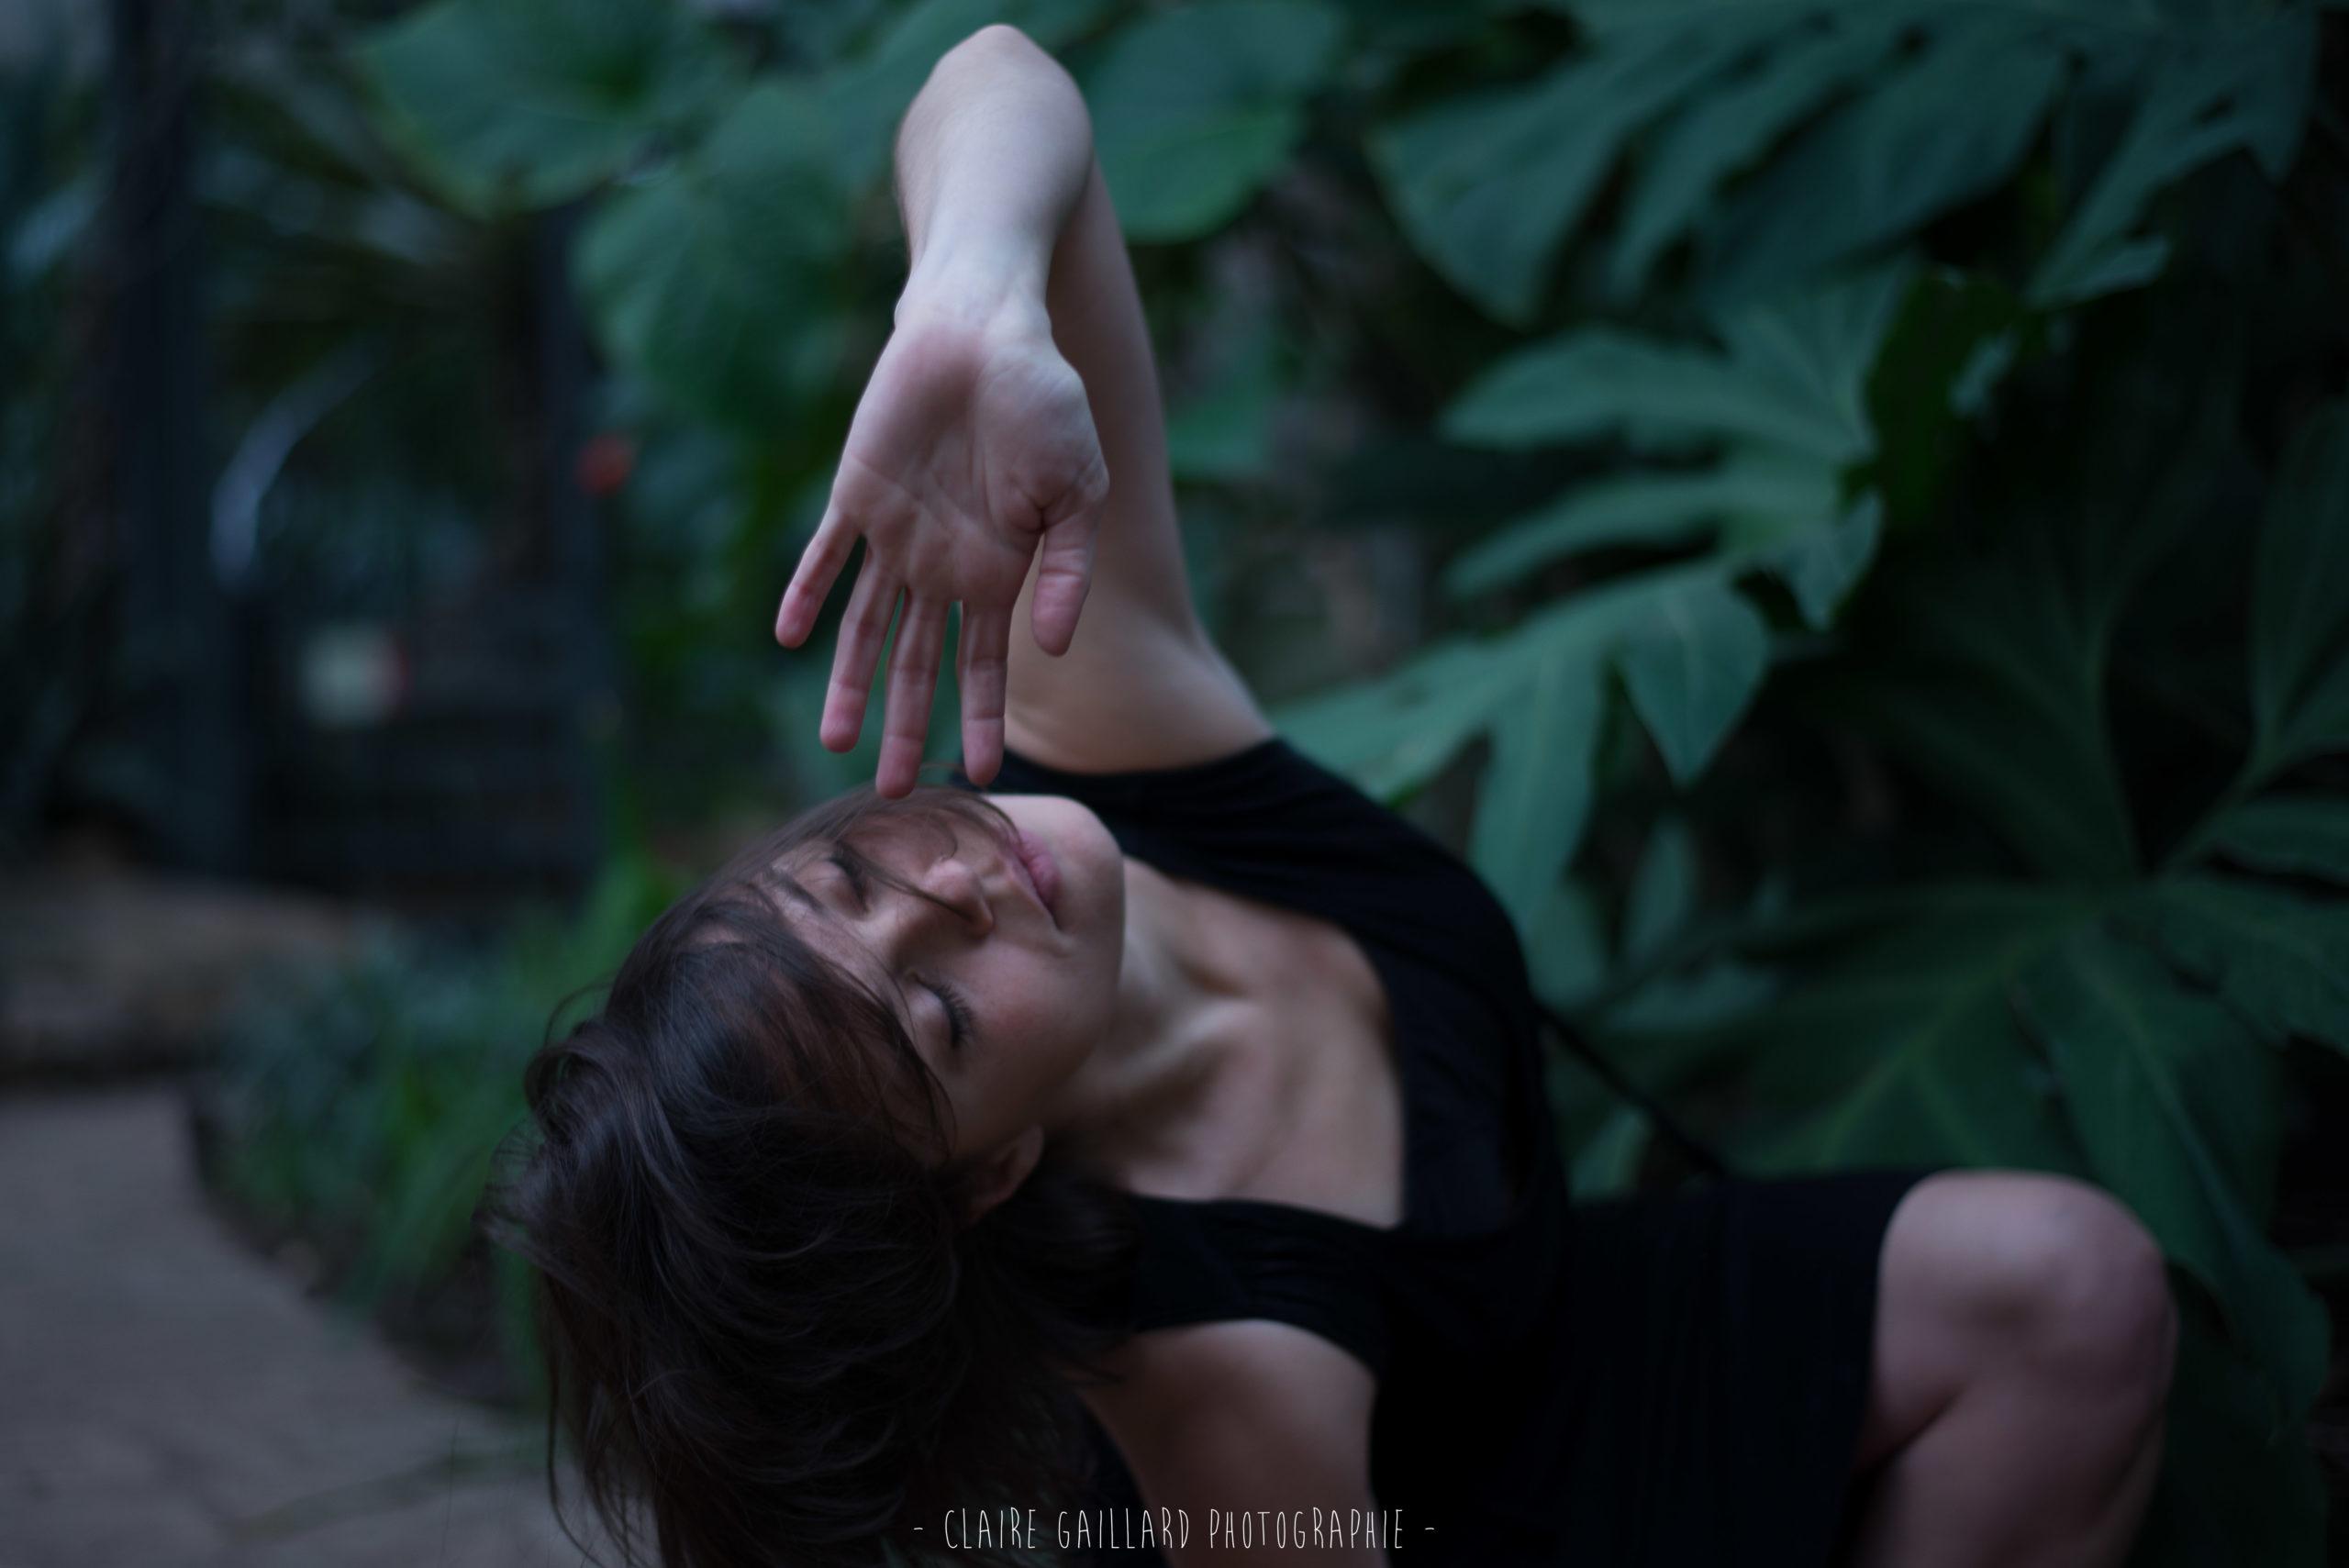 séance_danse©claire_gaillard20